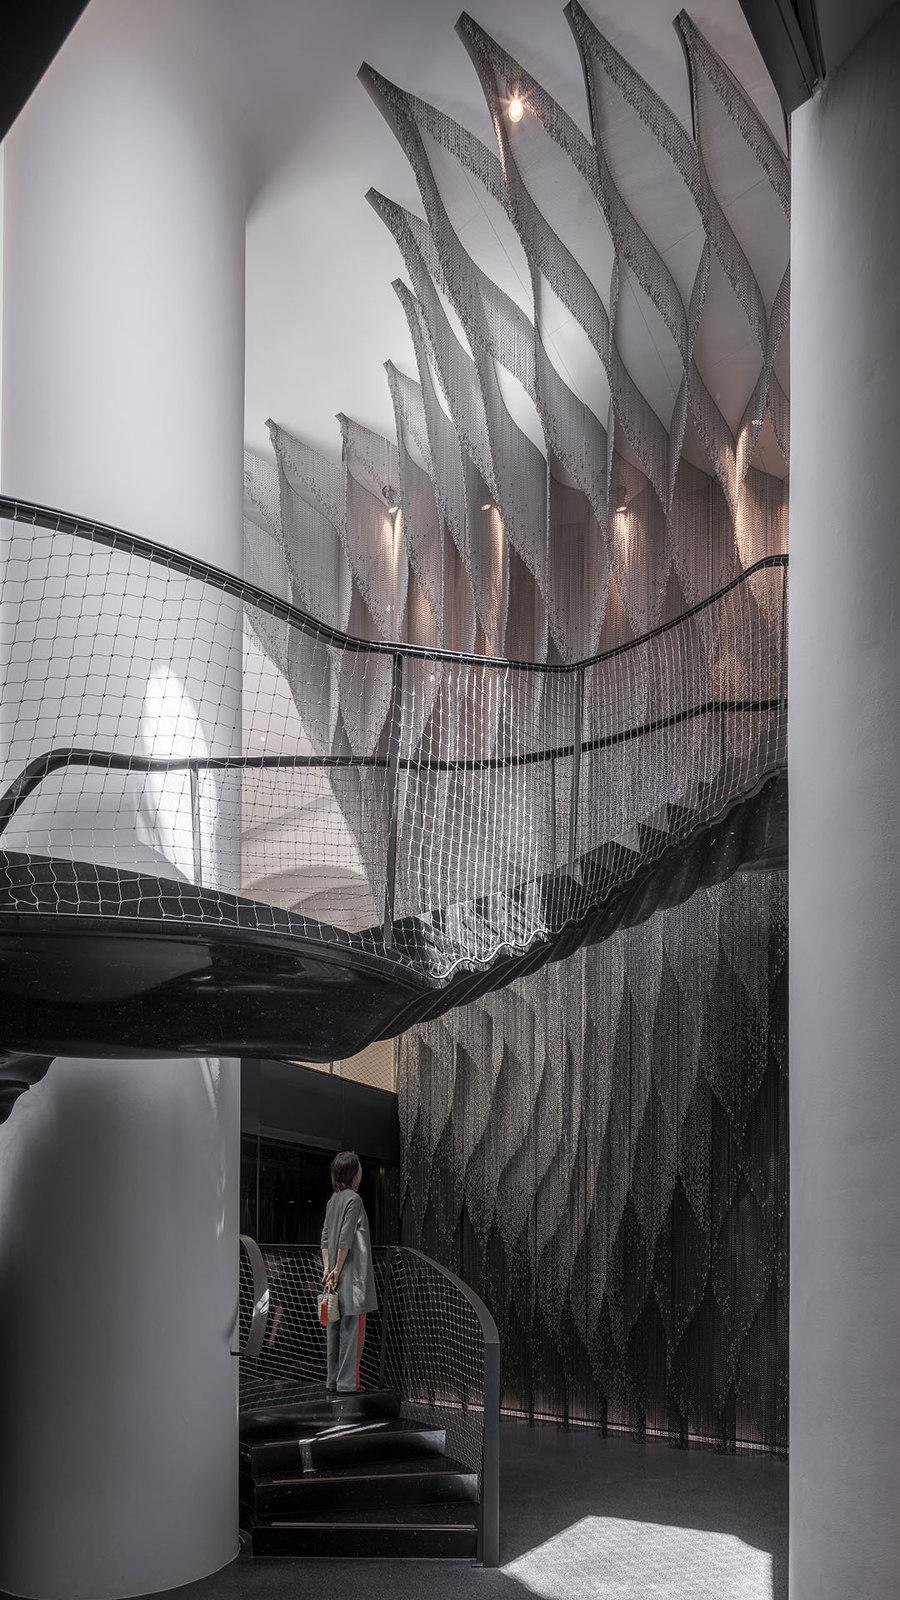 New Interior for Casa Batlló Stairs & Atrium by Kengo Kuma | Installations